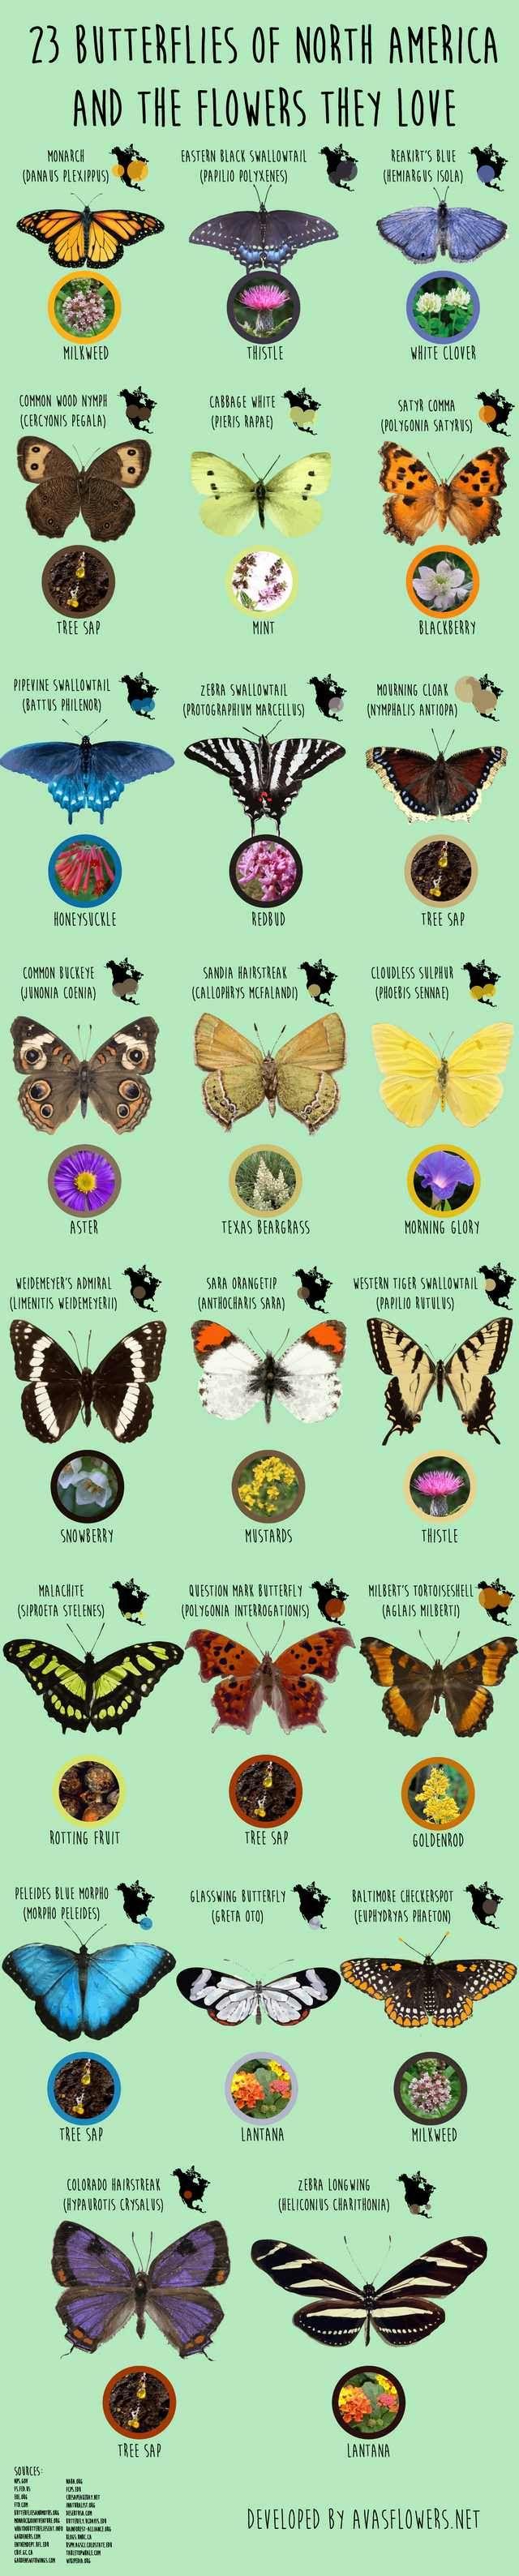 North American Butterflies - Imgur